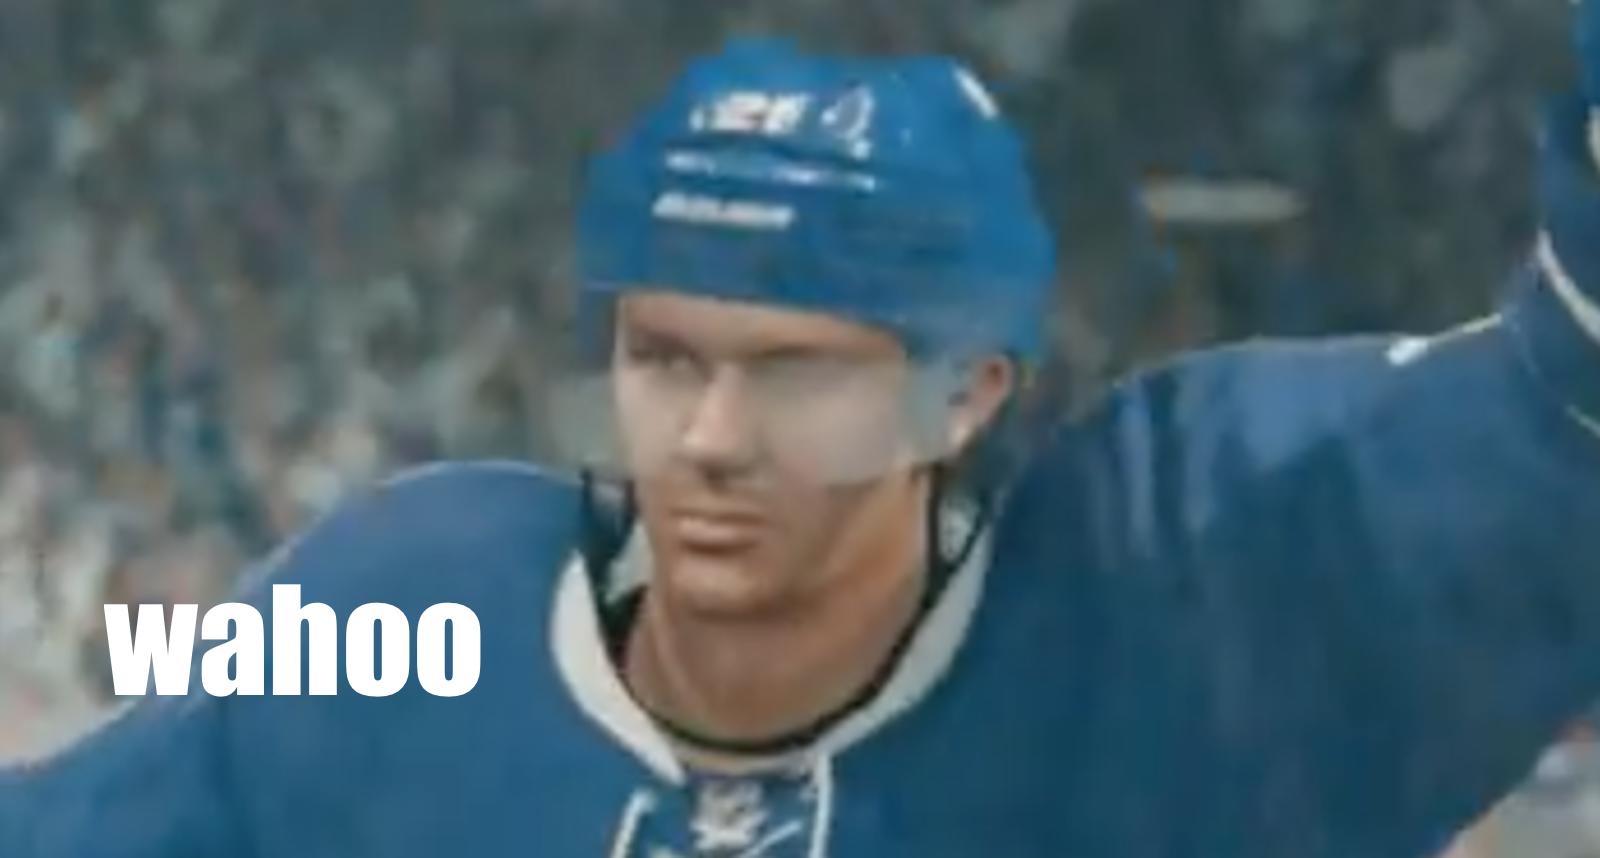 National Hockey League 18 Semi-Revealed With New Teaser Trailer